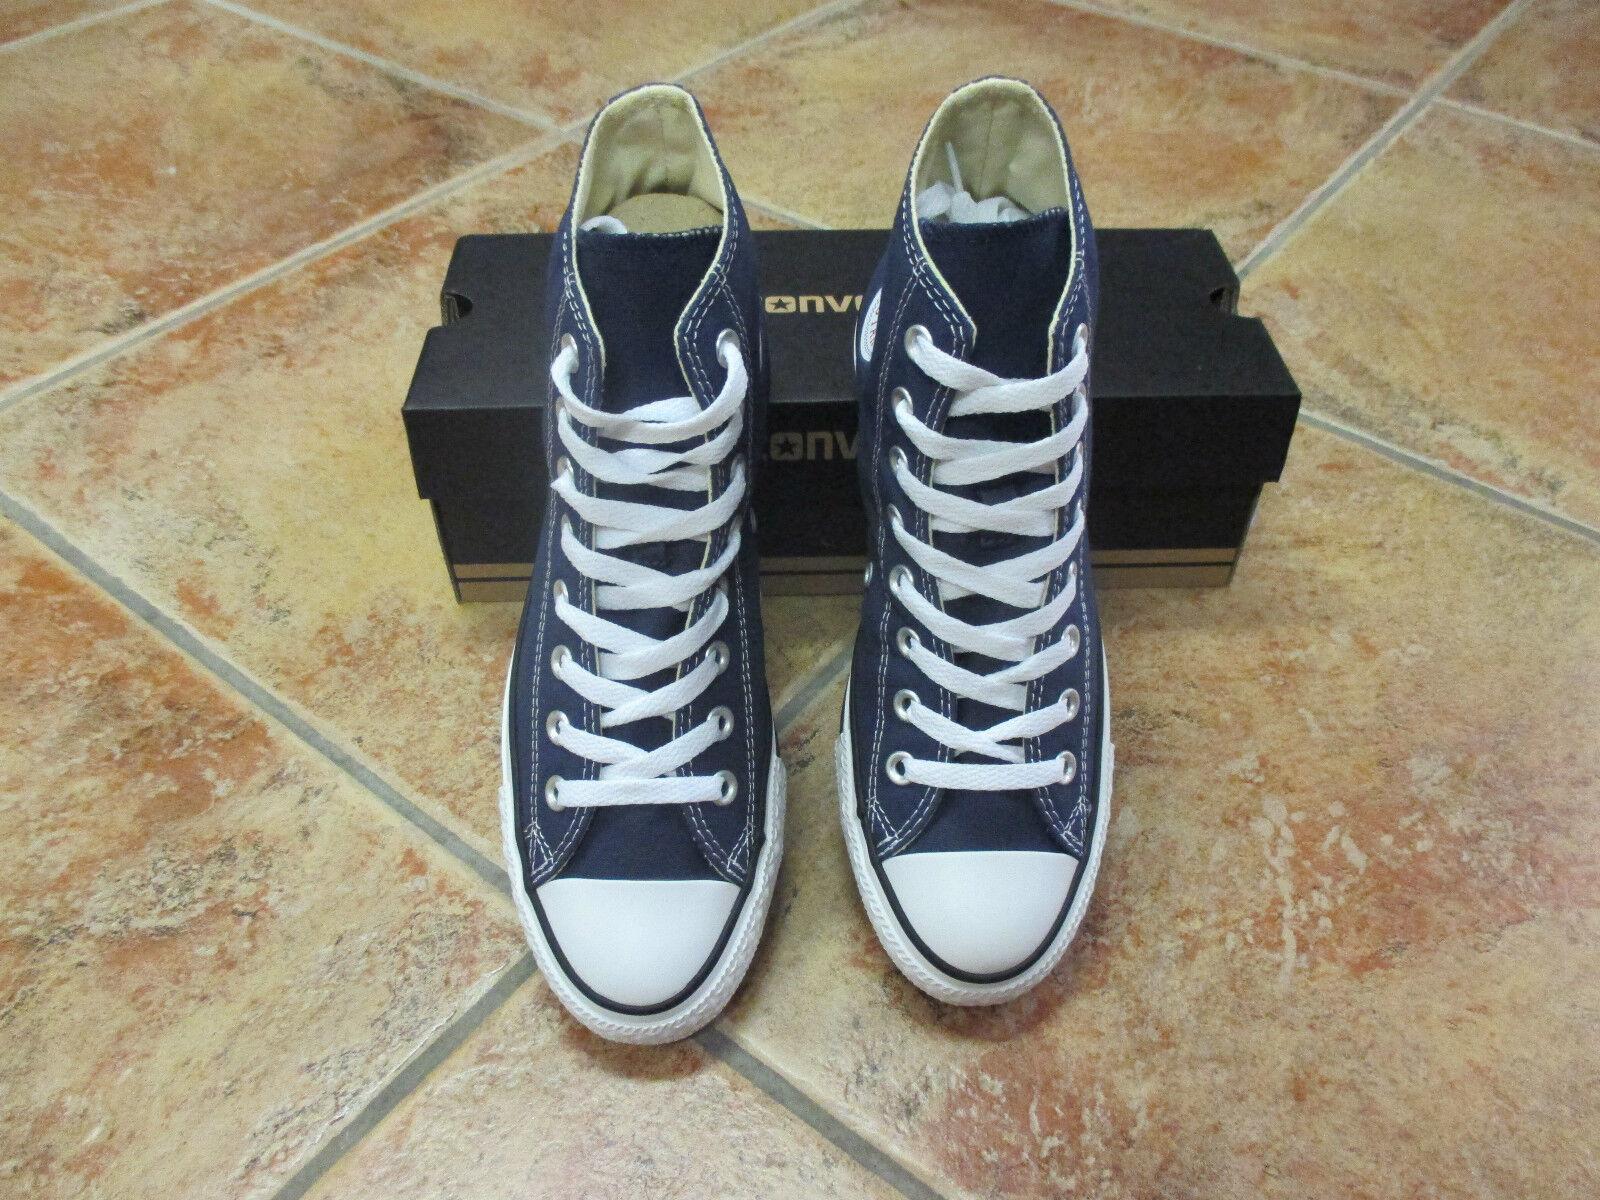 Converse Chucks All Star HI Größe 42 blau navy M9622C NEU Sneaker